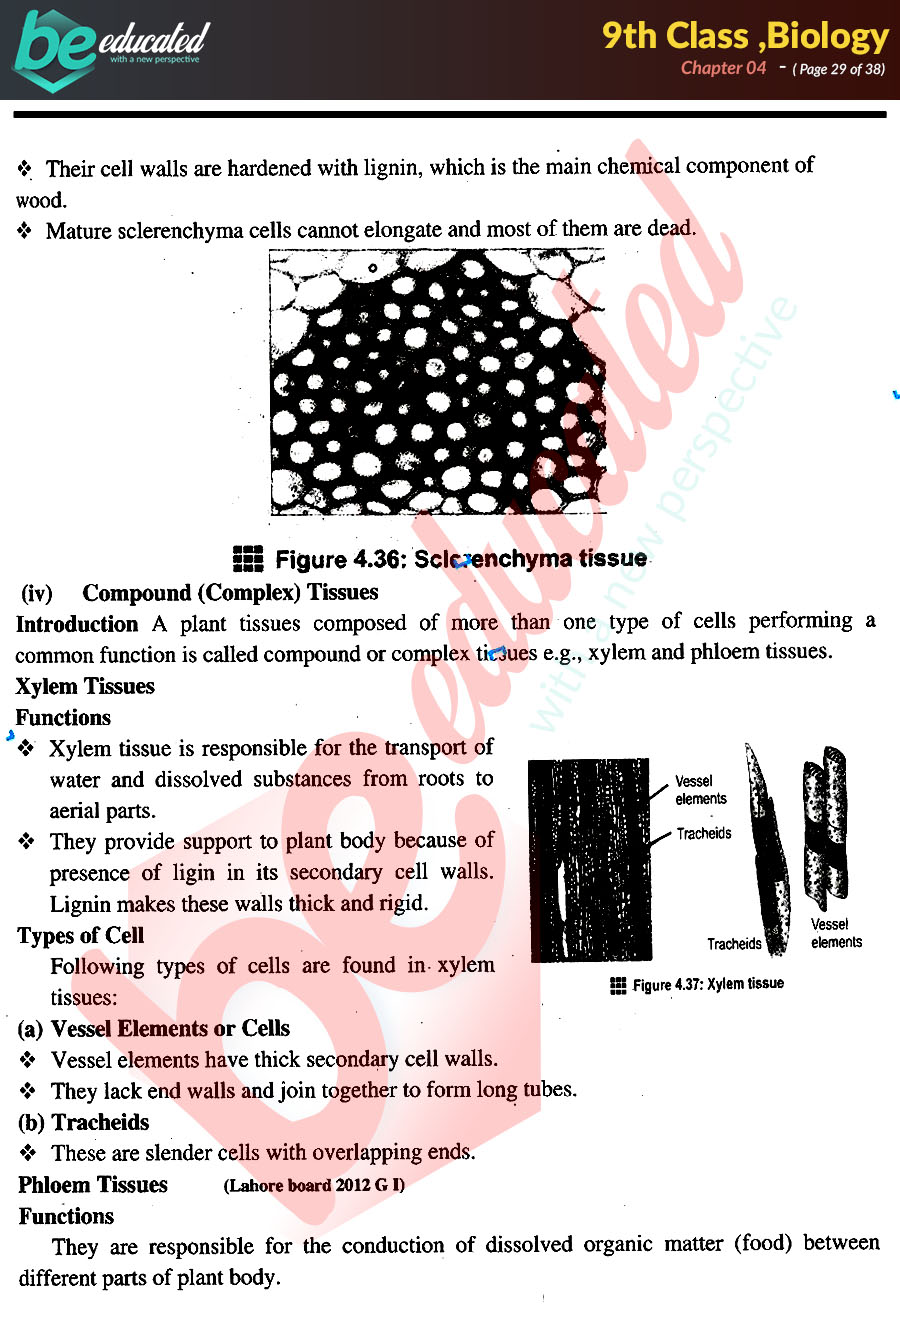 9th Class Biology Book Kpk Pdf